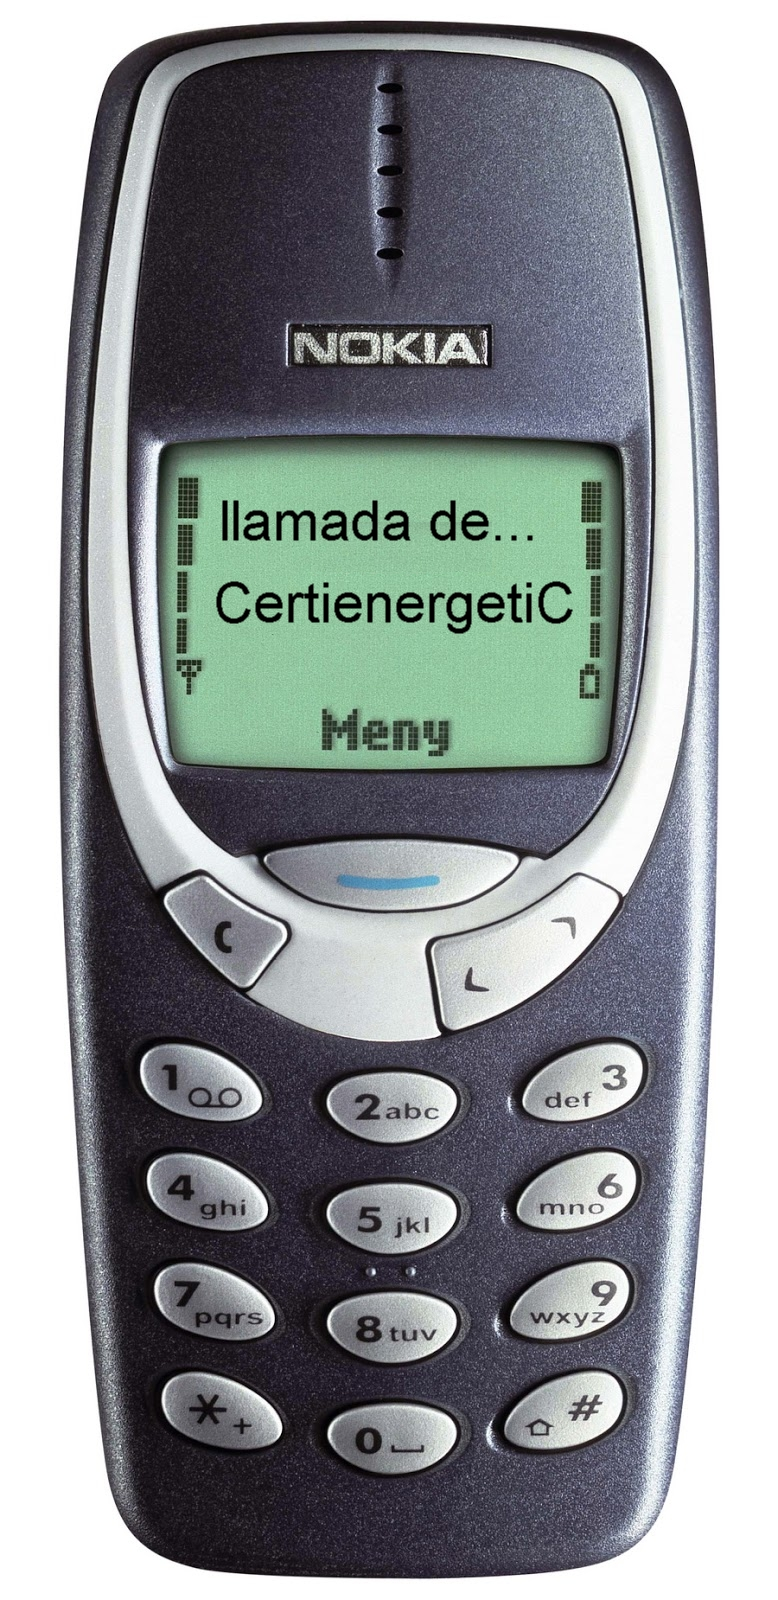 CertienergetiC Nokia2